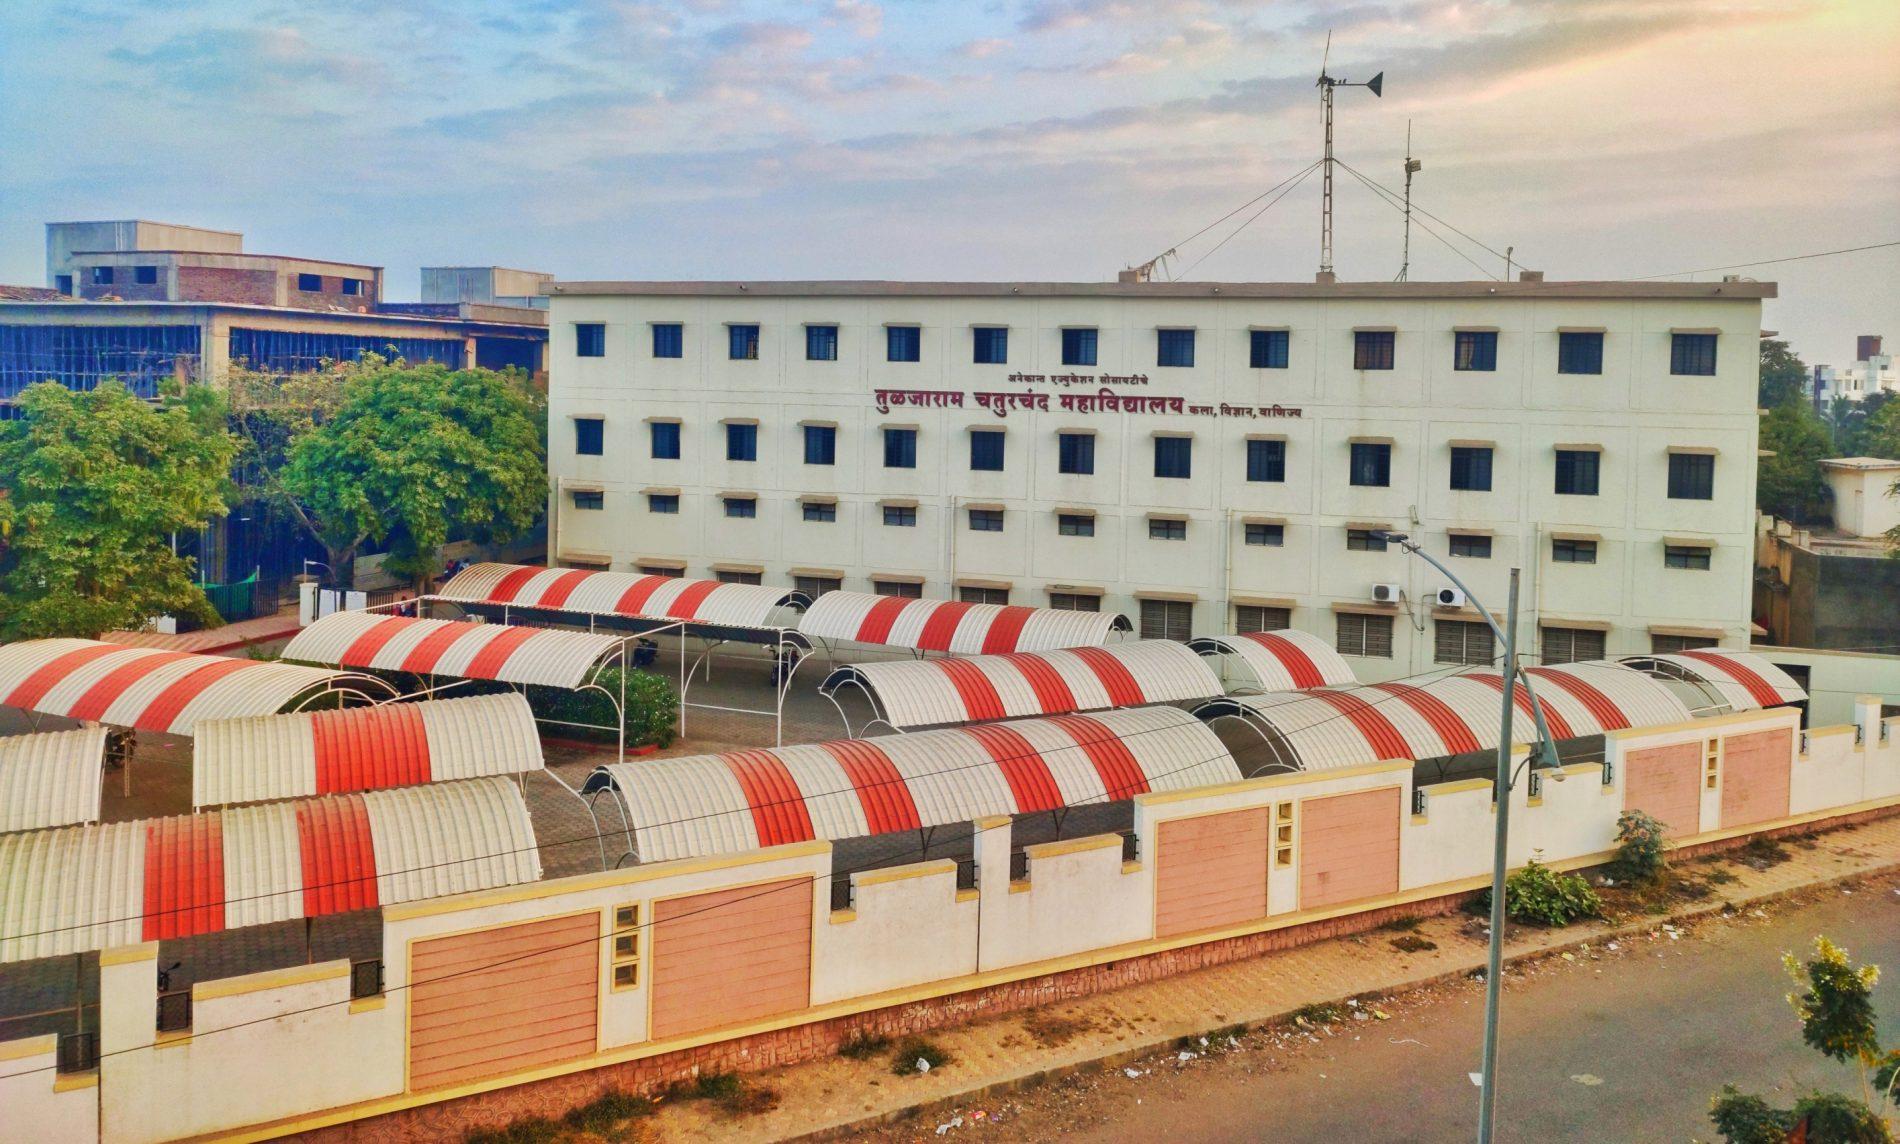 Tuljaram Chaturchand College Of Arts, Science & Commerce, Baramati